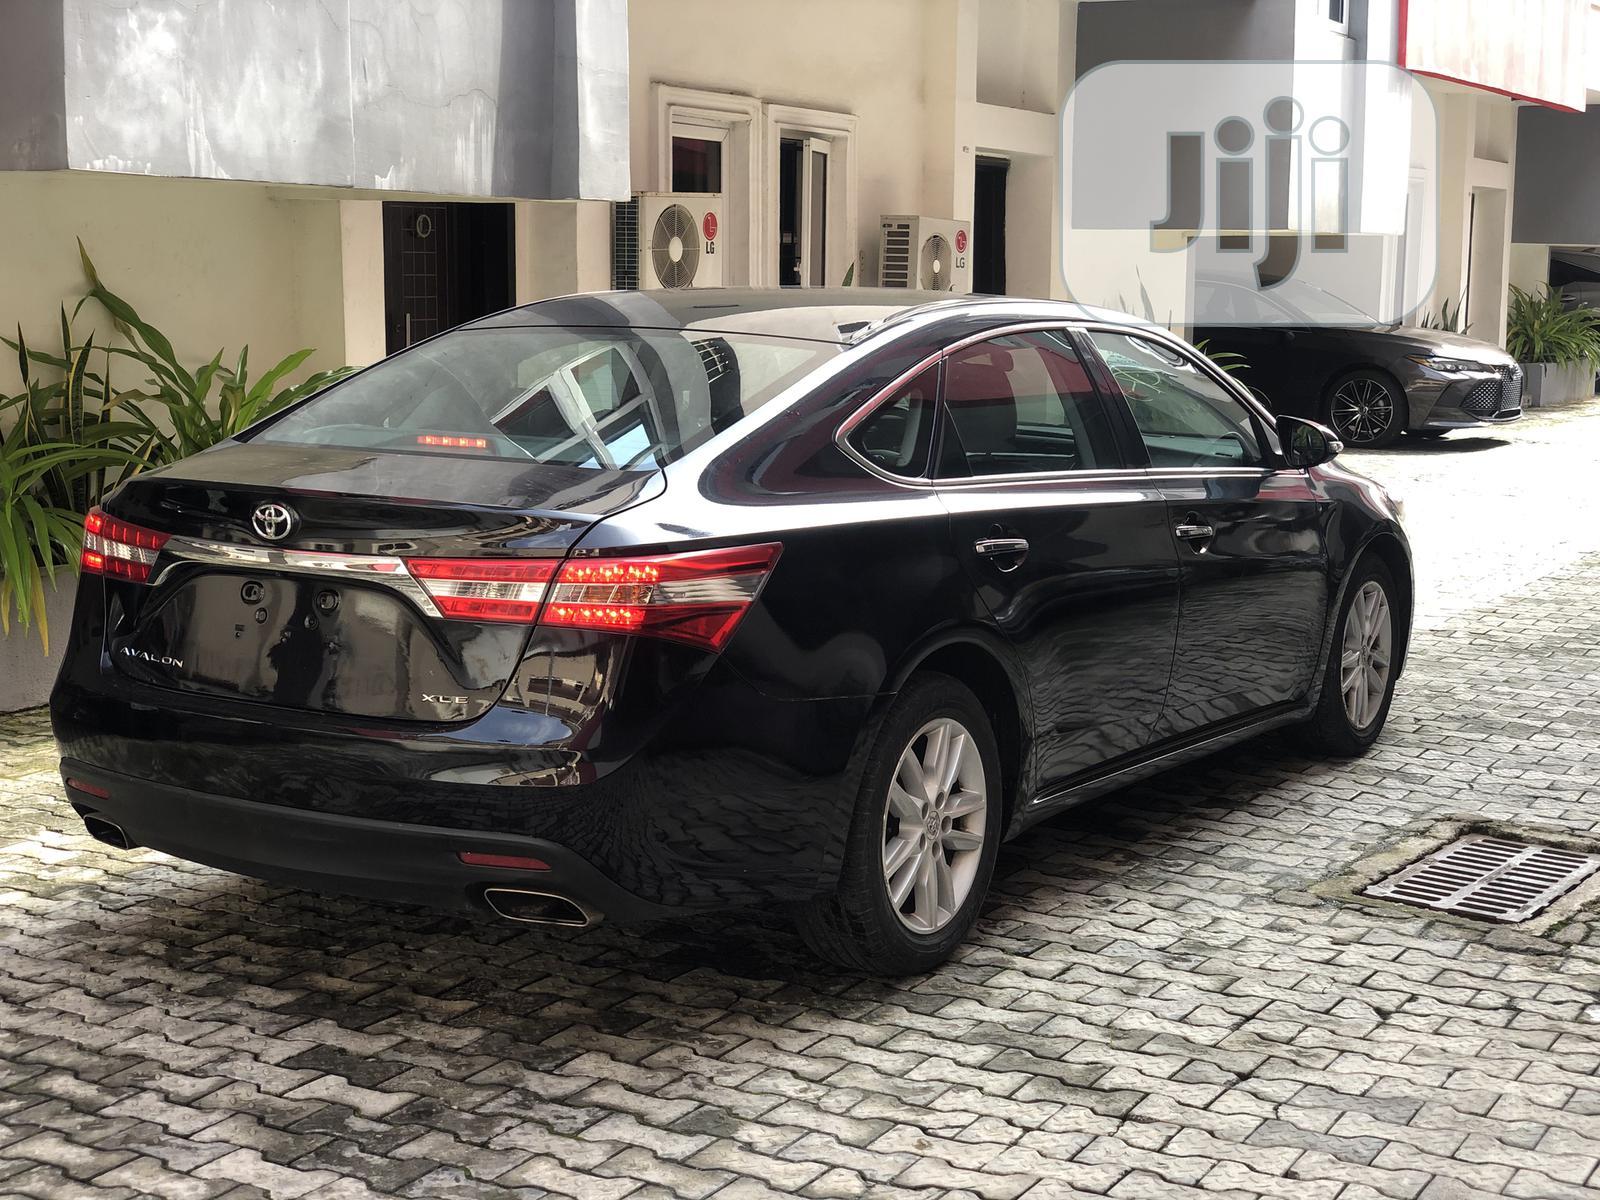 Toyota Avalon 2014 Black   Cars for sale in Lekki, Lagos State, Nigeria